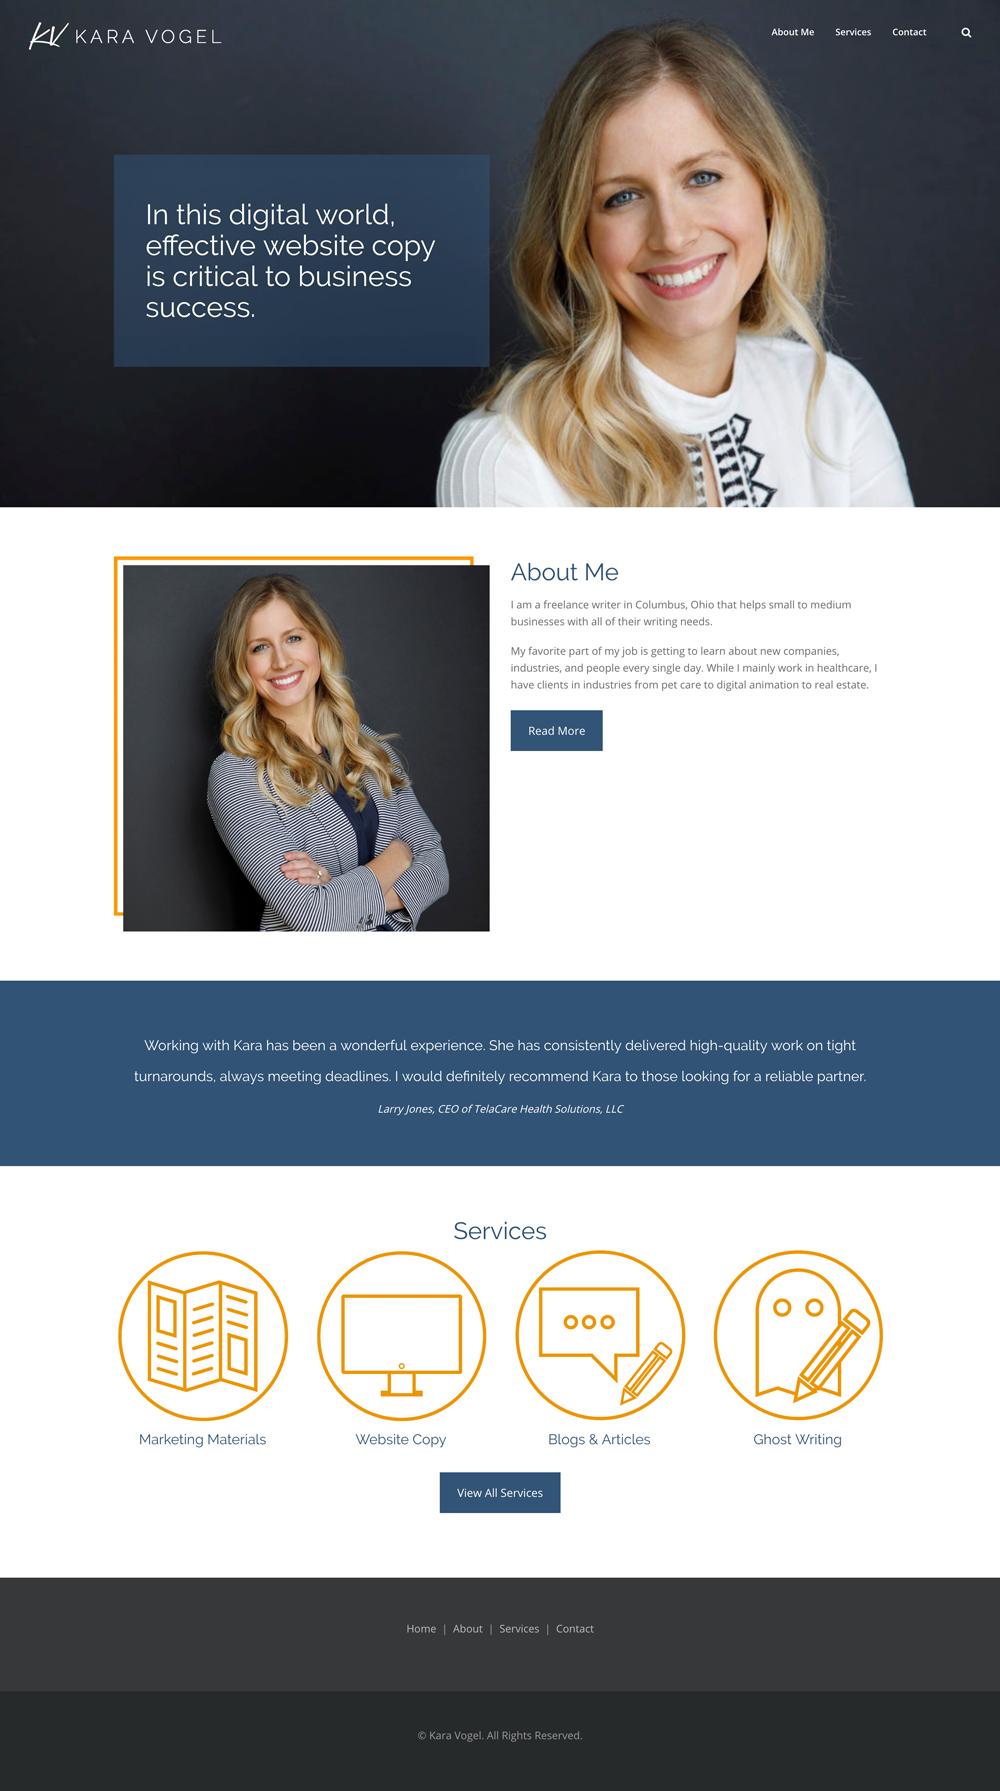 Kara Vogel Website